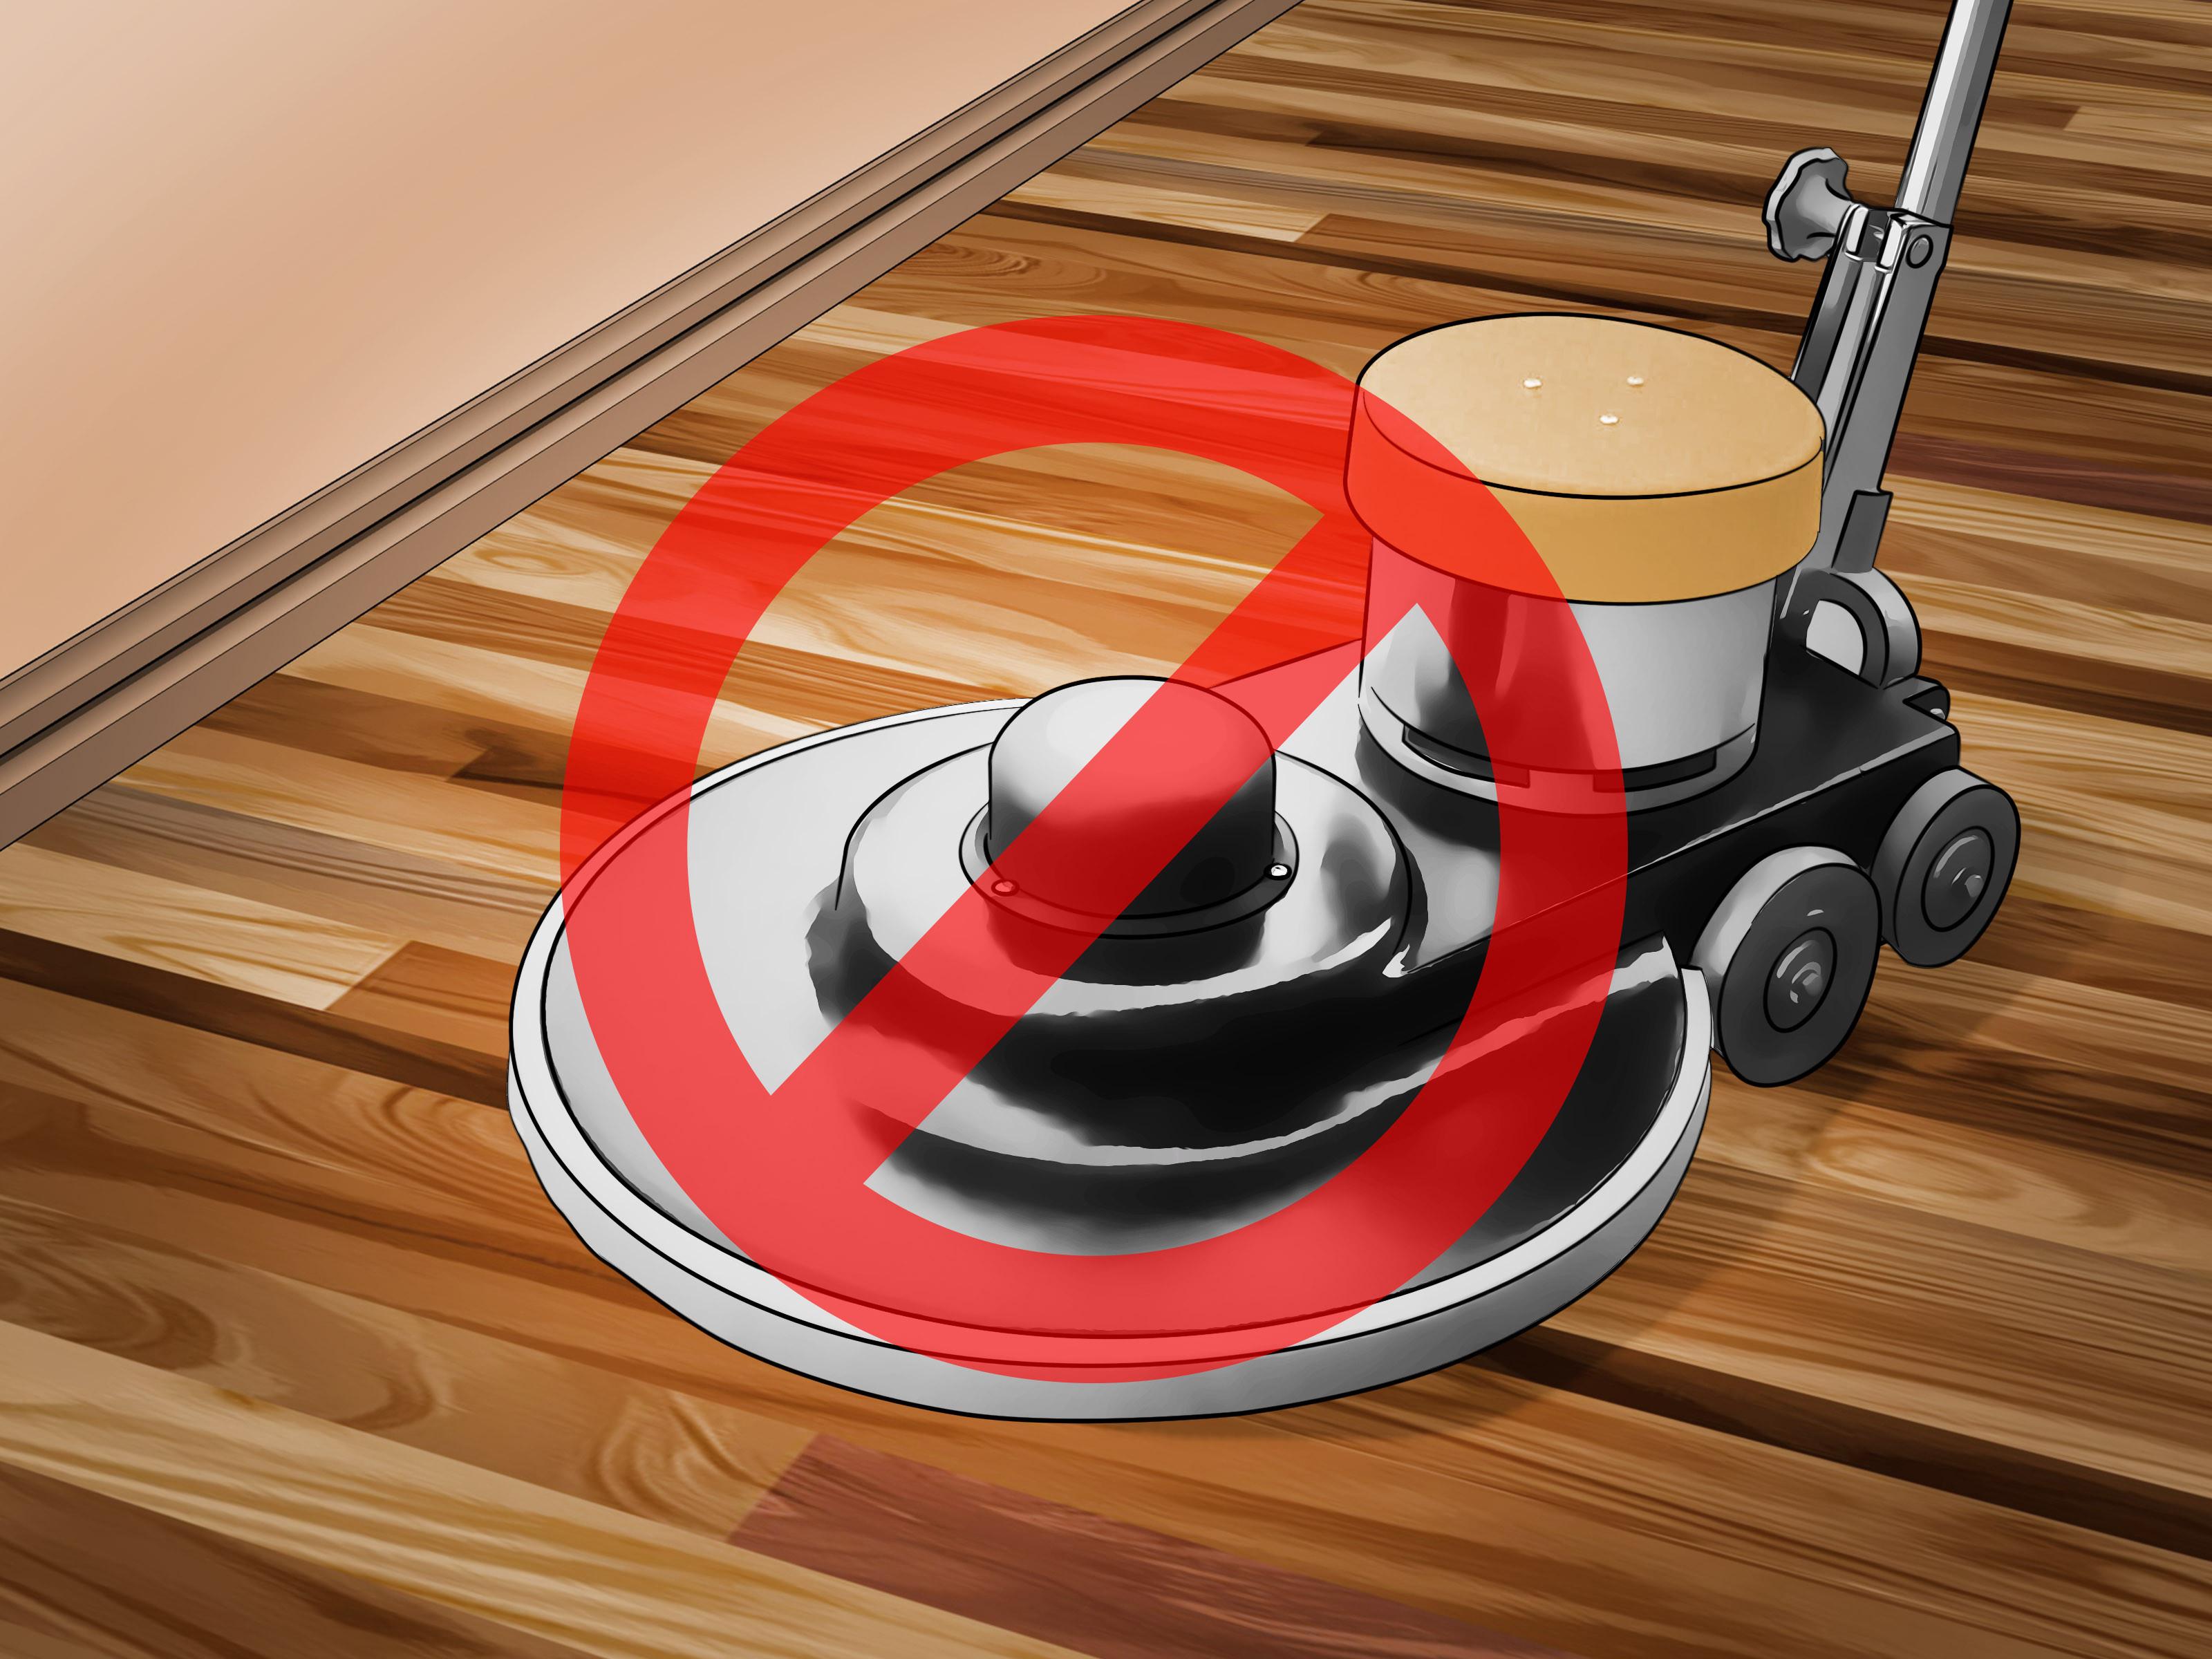 top vacuum cleaners for hardwood floors of 4 ways to clean polyurethane wood floors wikihow pertaining to clean polyurethane wood floors step 15